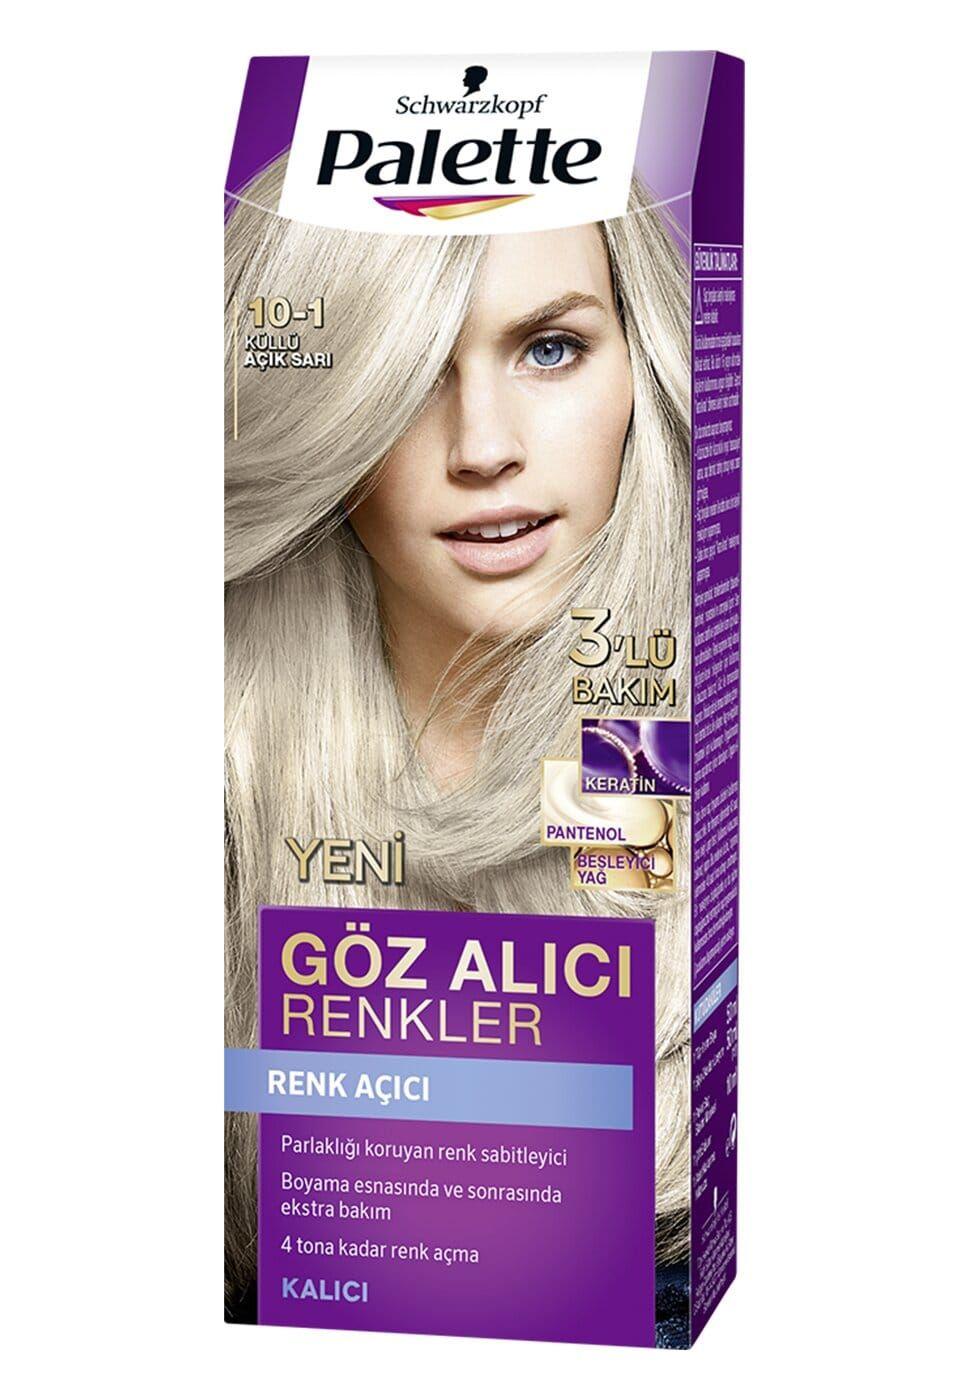 Schwarzkopf Palette Yogun Goz Alici Renkler Sac Boyasi 10 1 Kullu Acik Sari 2020 Sac Boyasi Sac Renkler